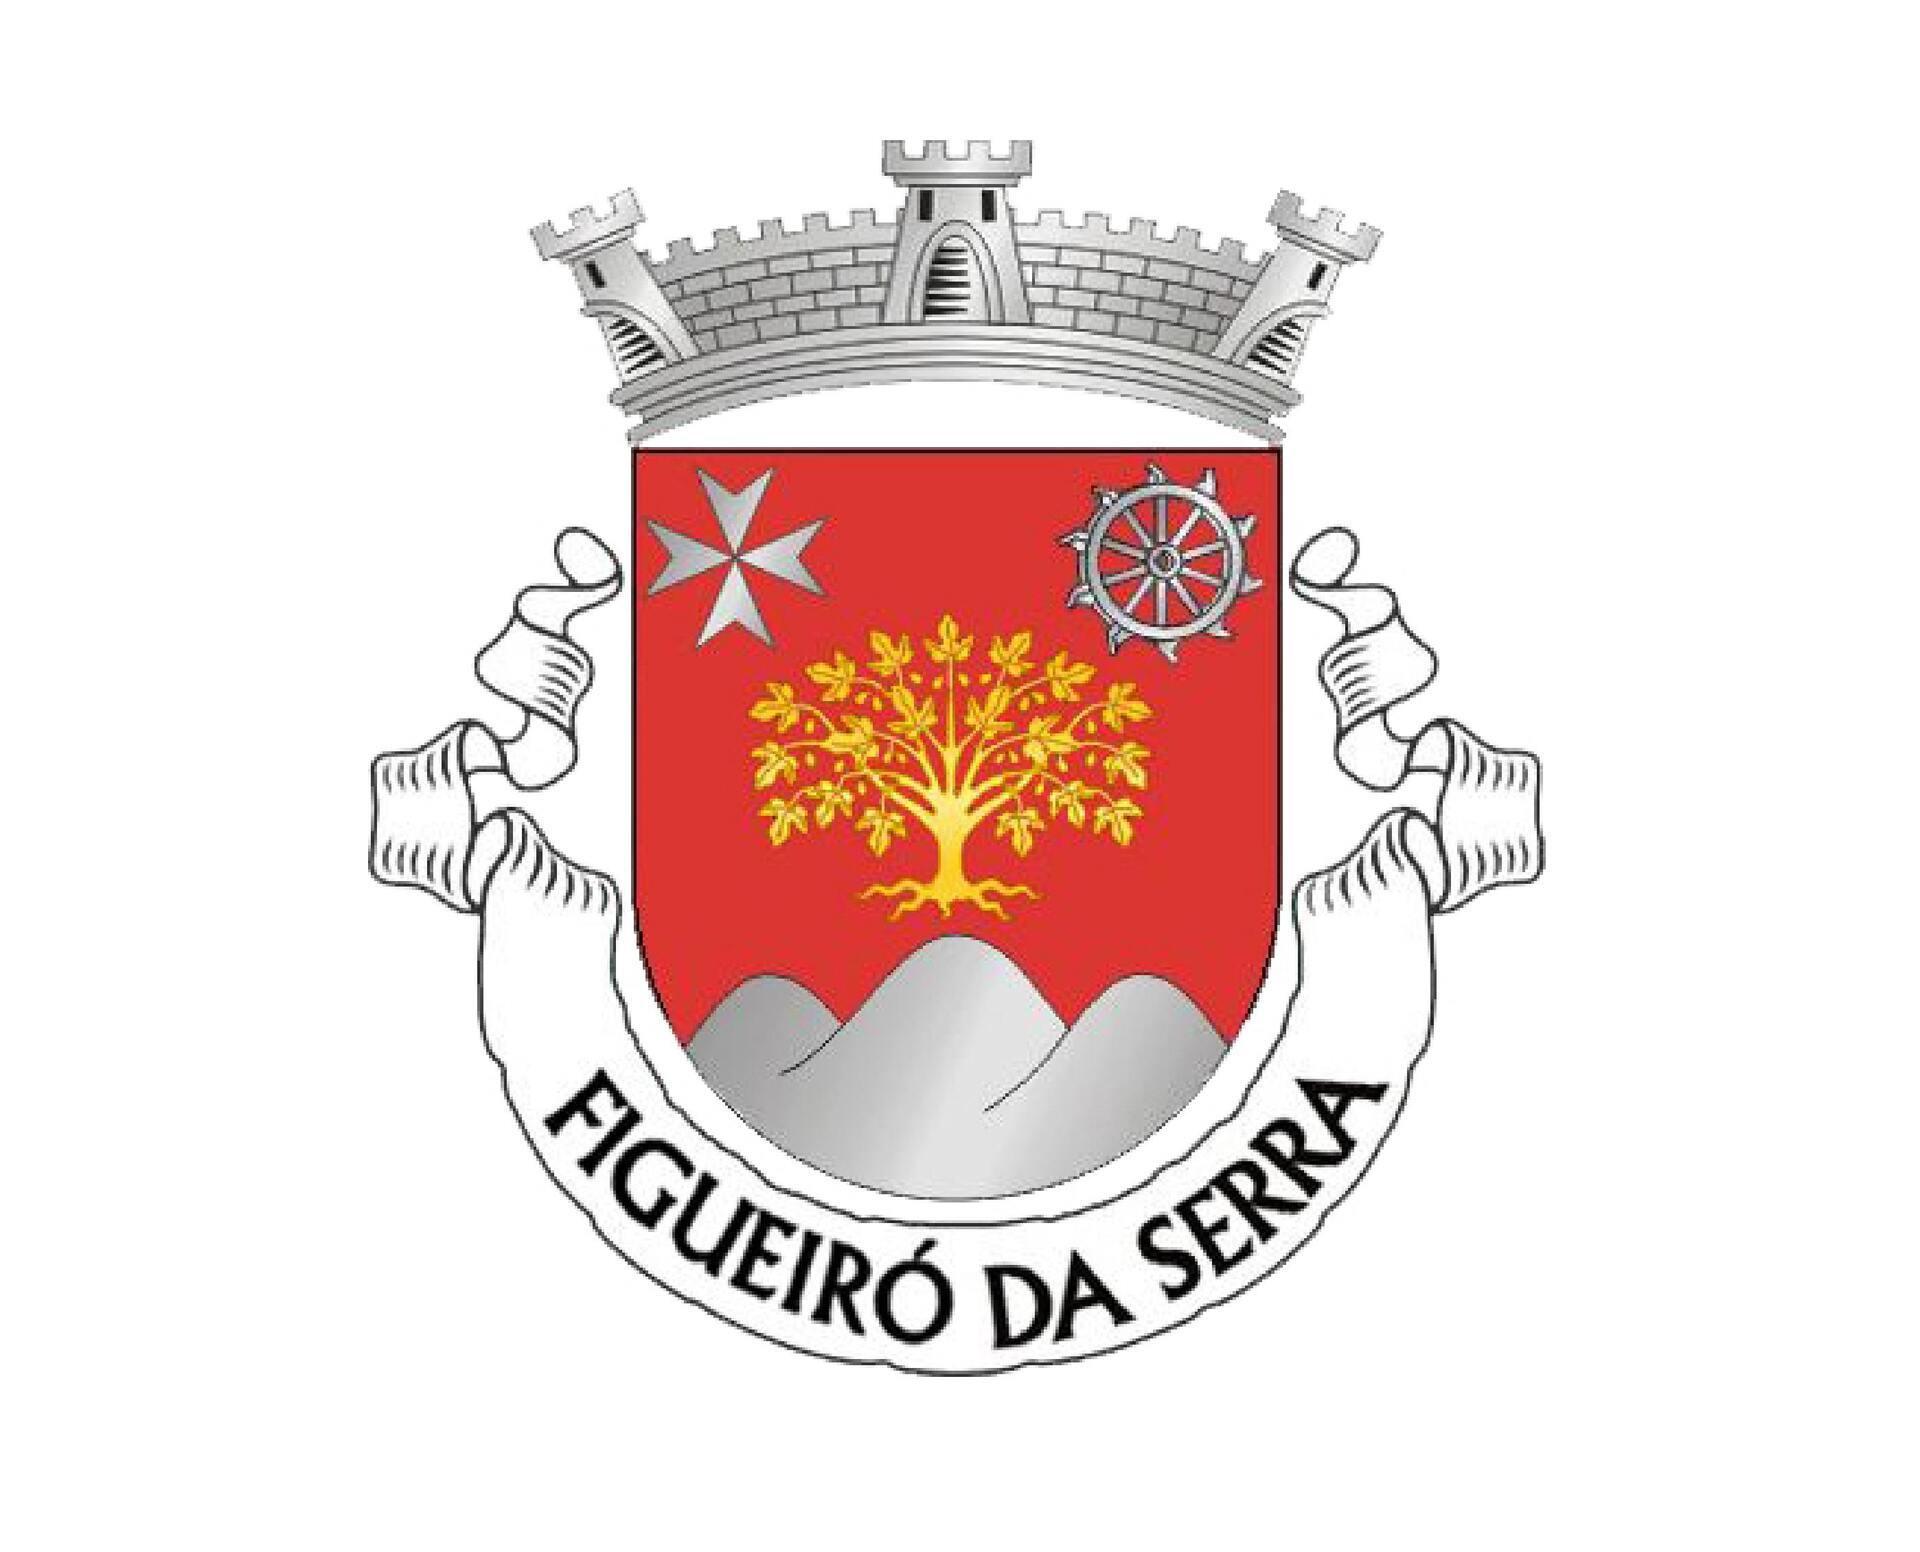 Brasão Figueiró da Serra